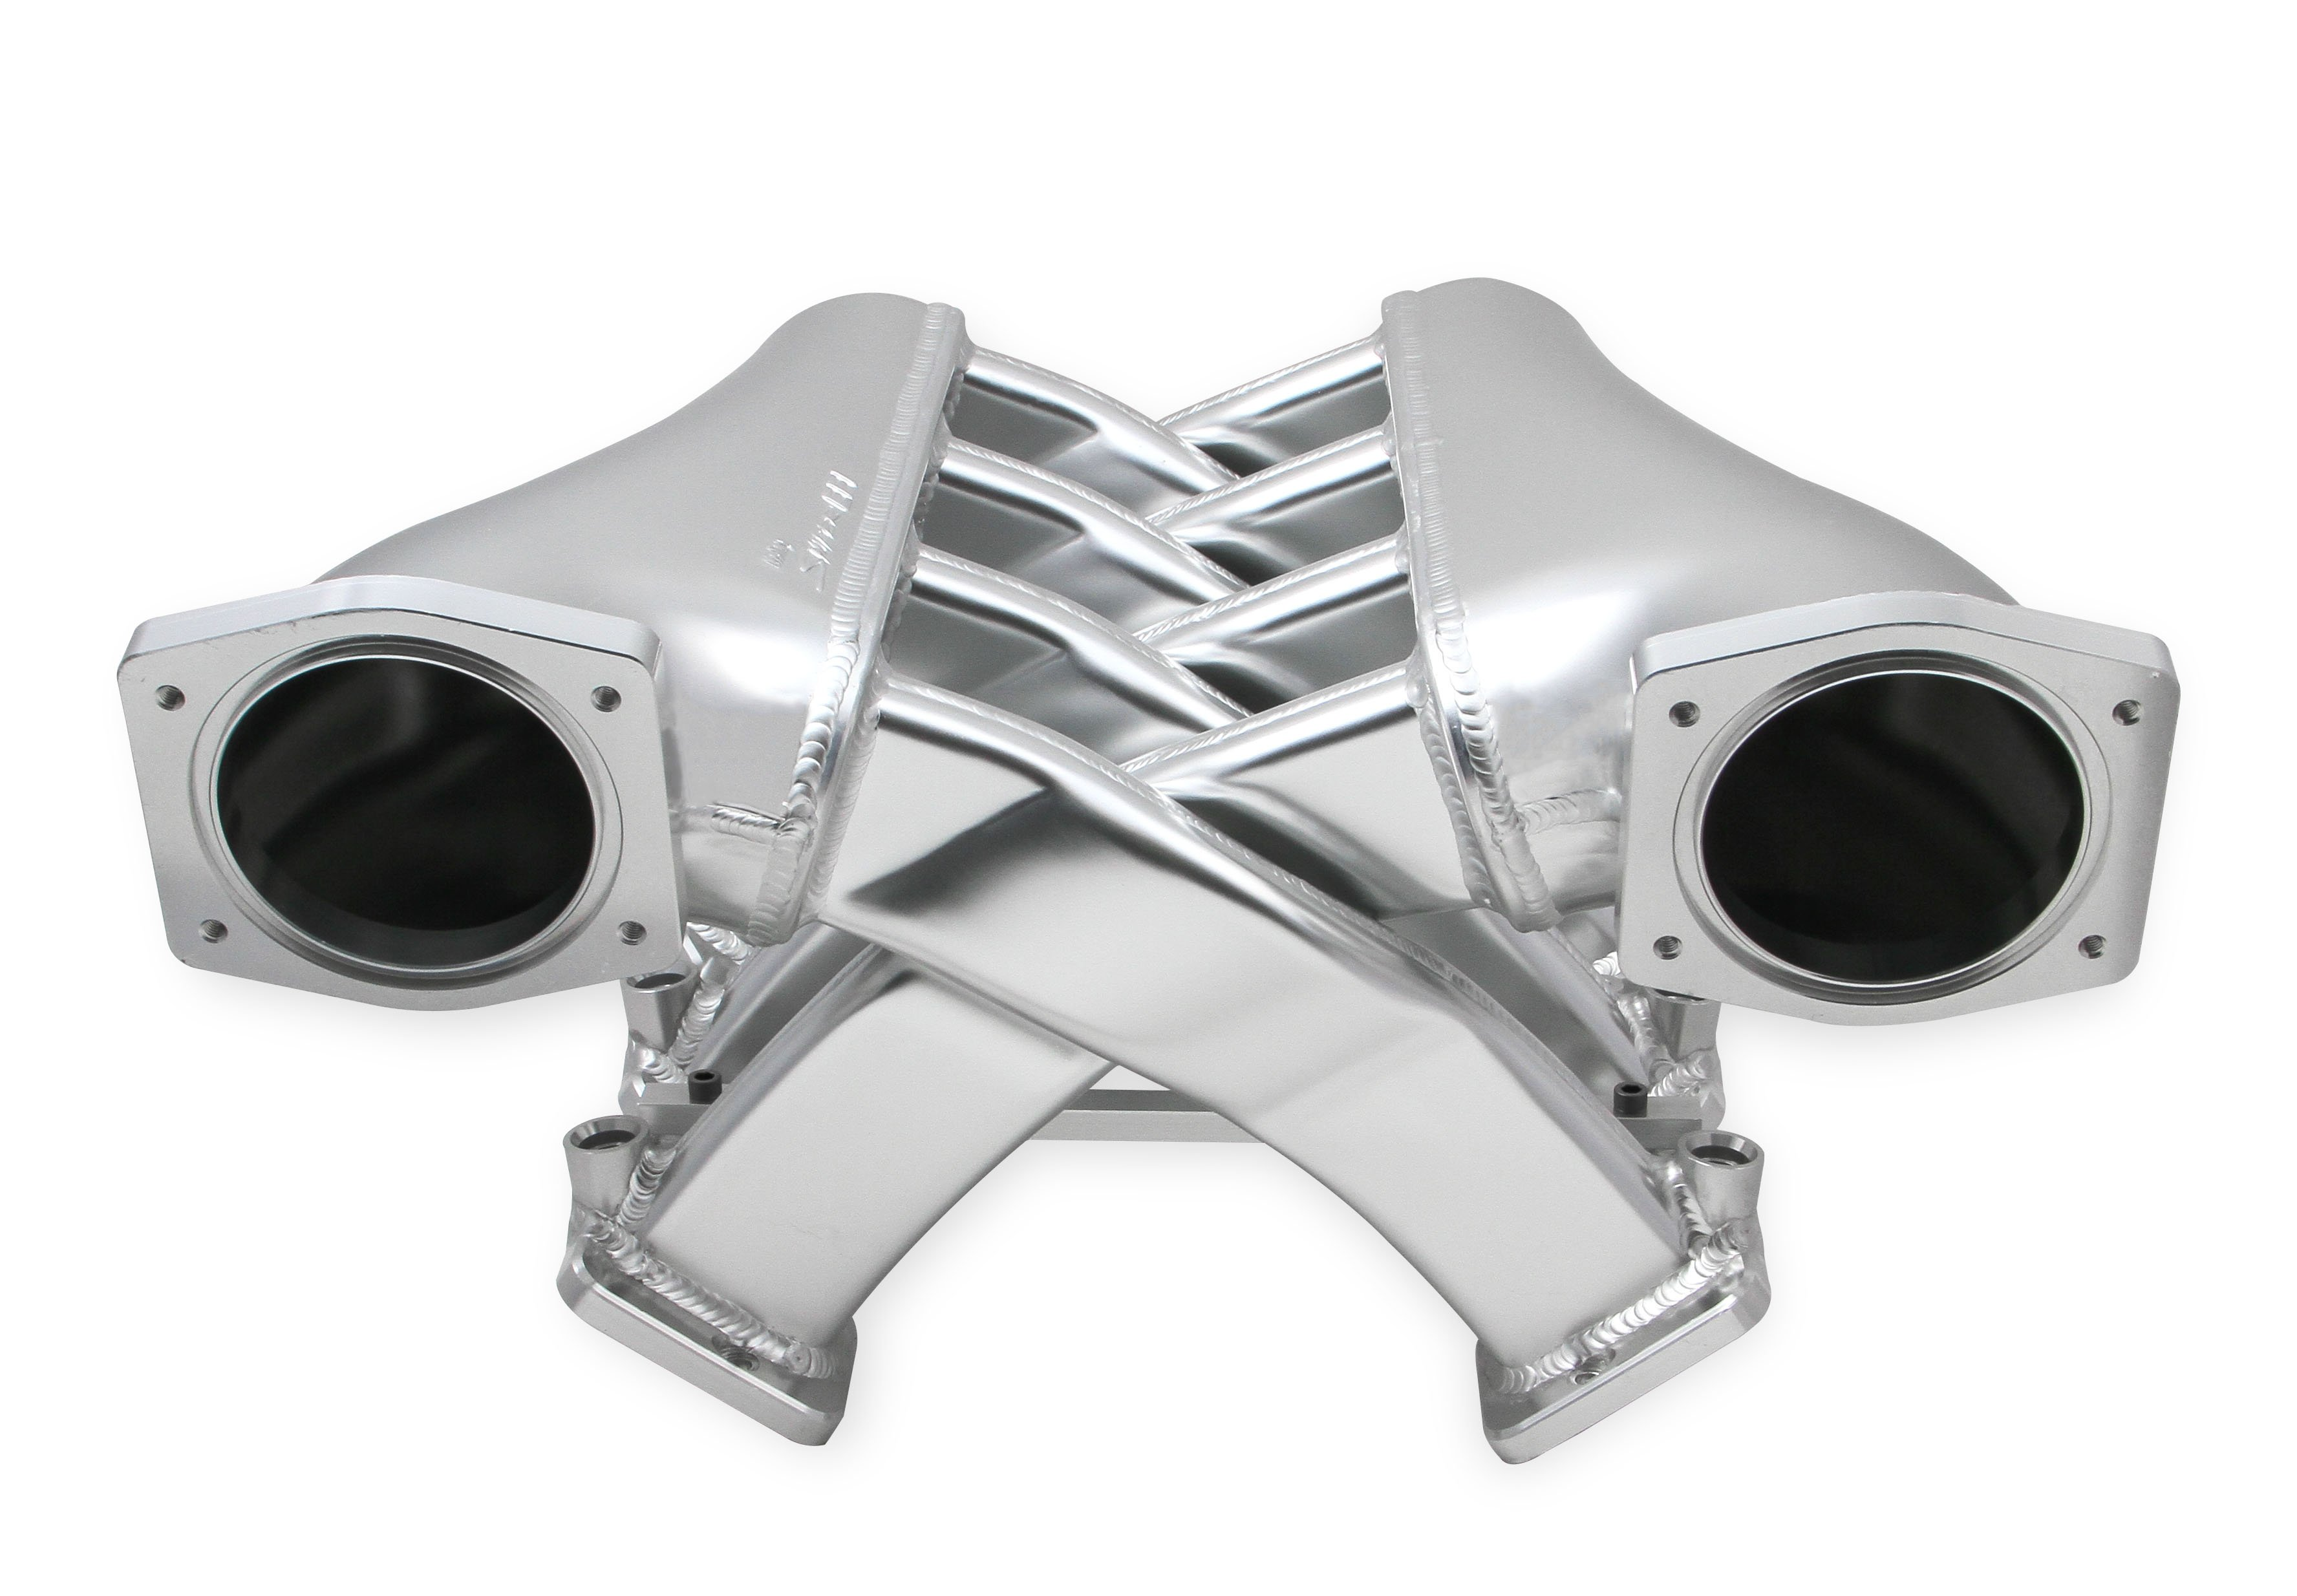 Sniper EFI Fabricated Intake Manifold Dual Plenum 92mm GM LS3/L92, TB  spacers, and Fuel Rail Kit - Silver